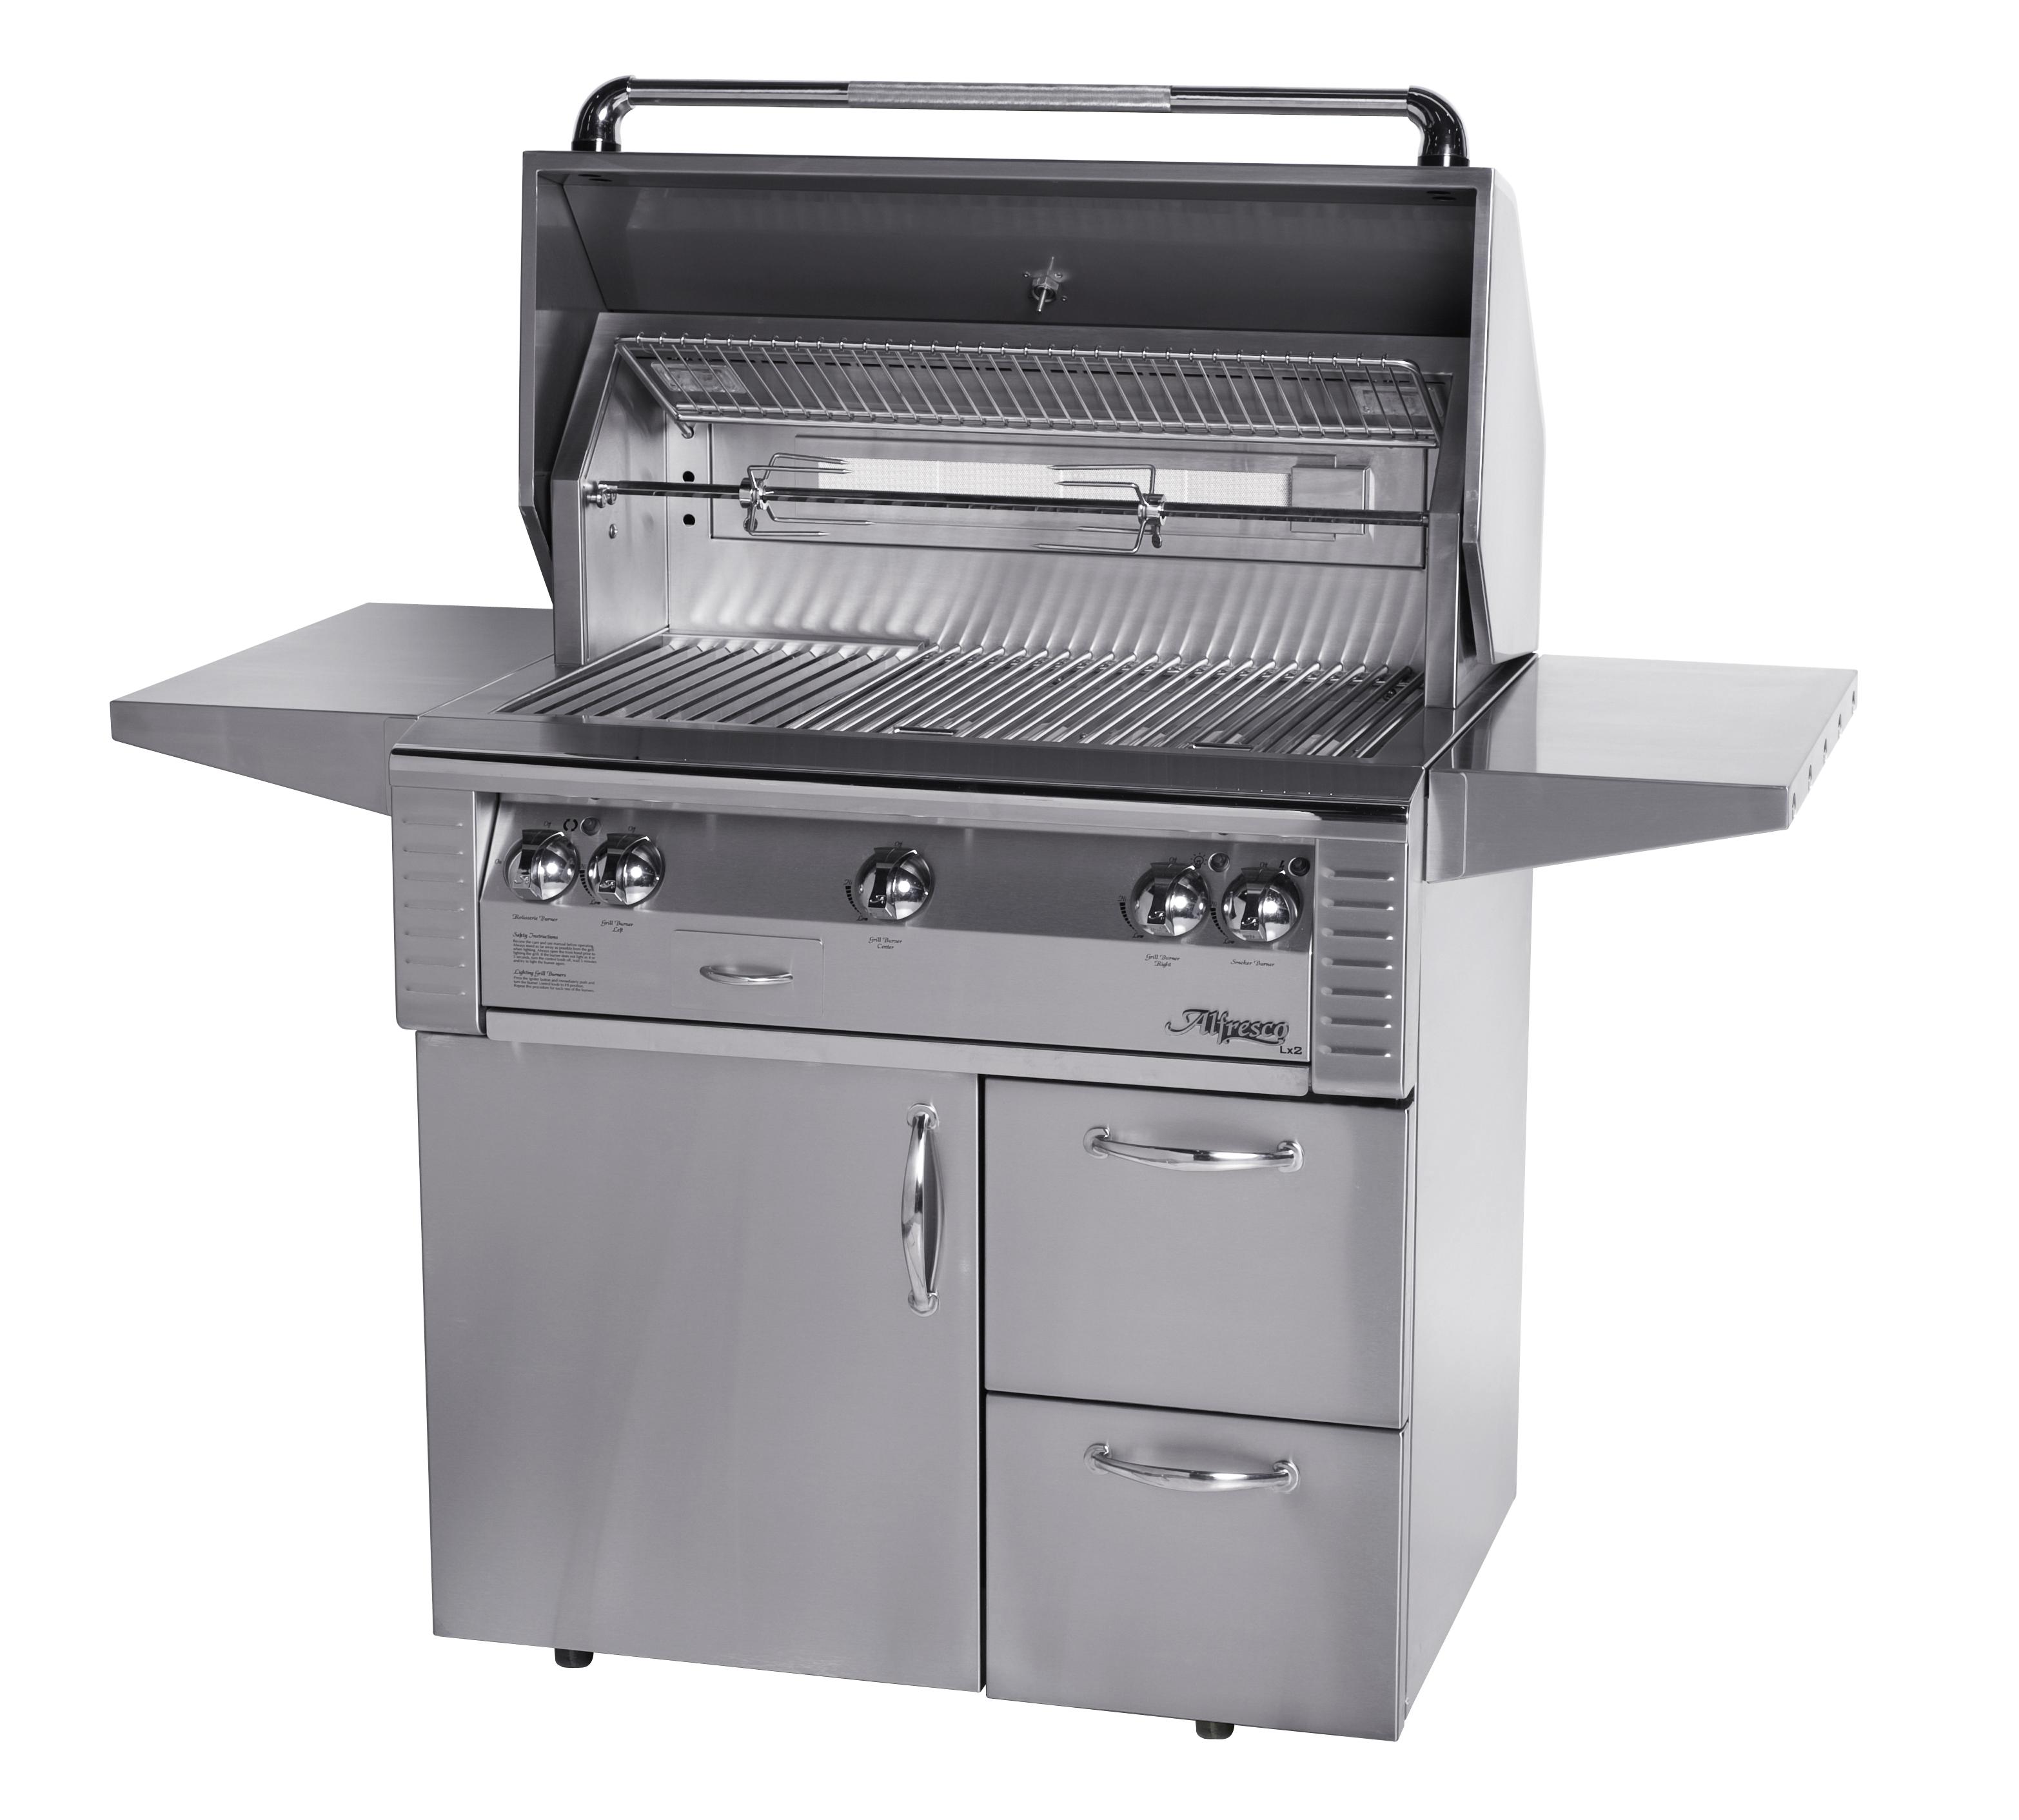 Alfresco Barbecue Grills & Accessories - Las Vegas Outdoor ...